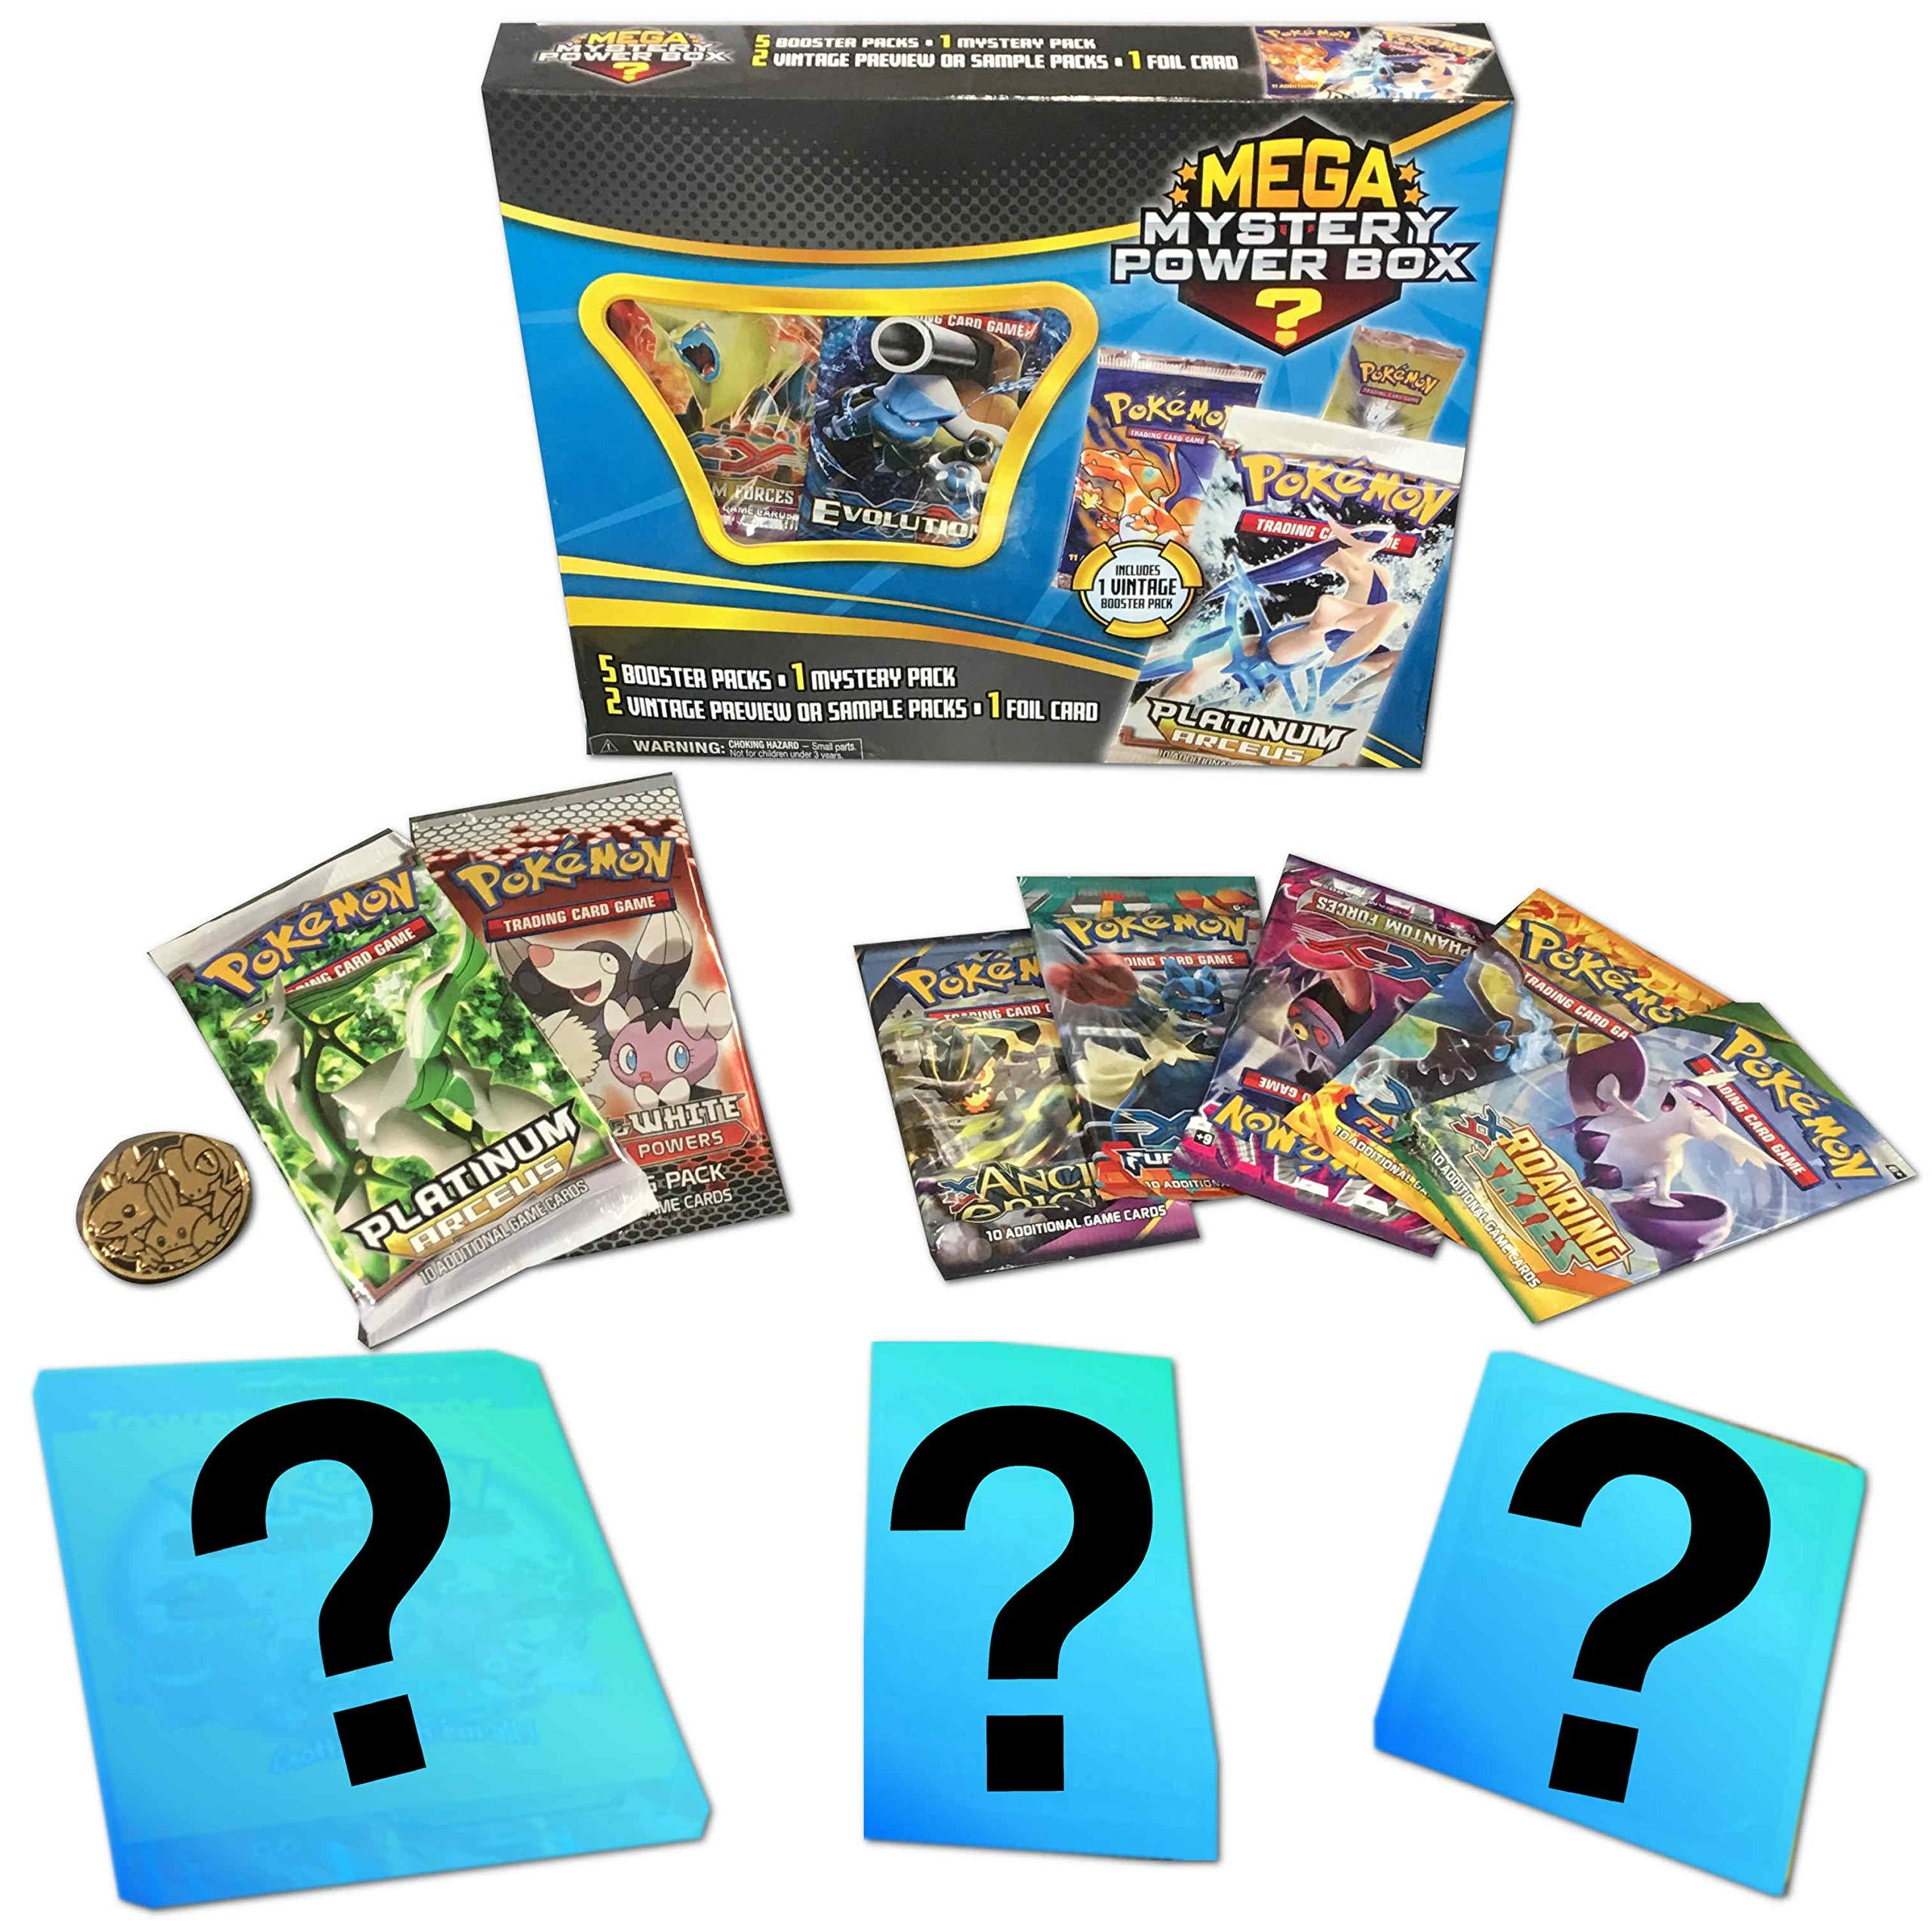 Pokemon TCG: Mystery Power Box #1-5 Booster Packs + A Foil Card